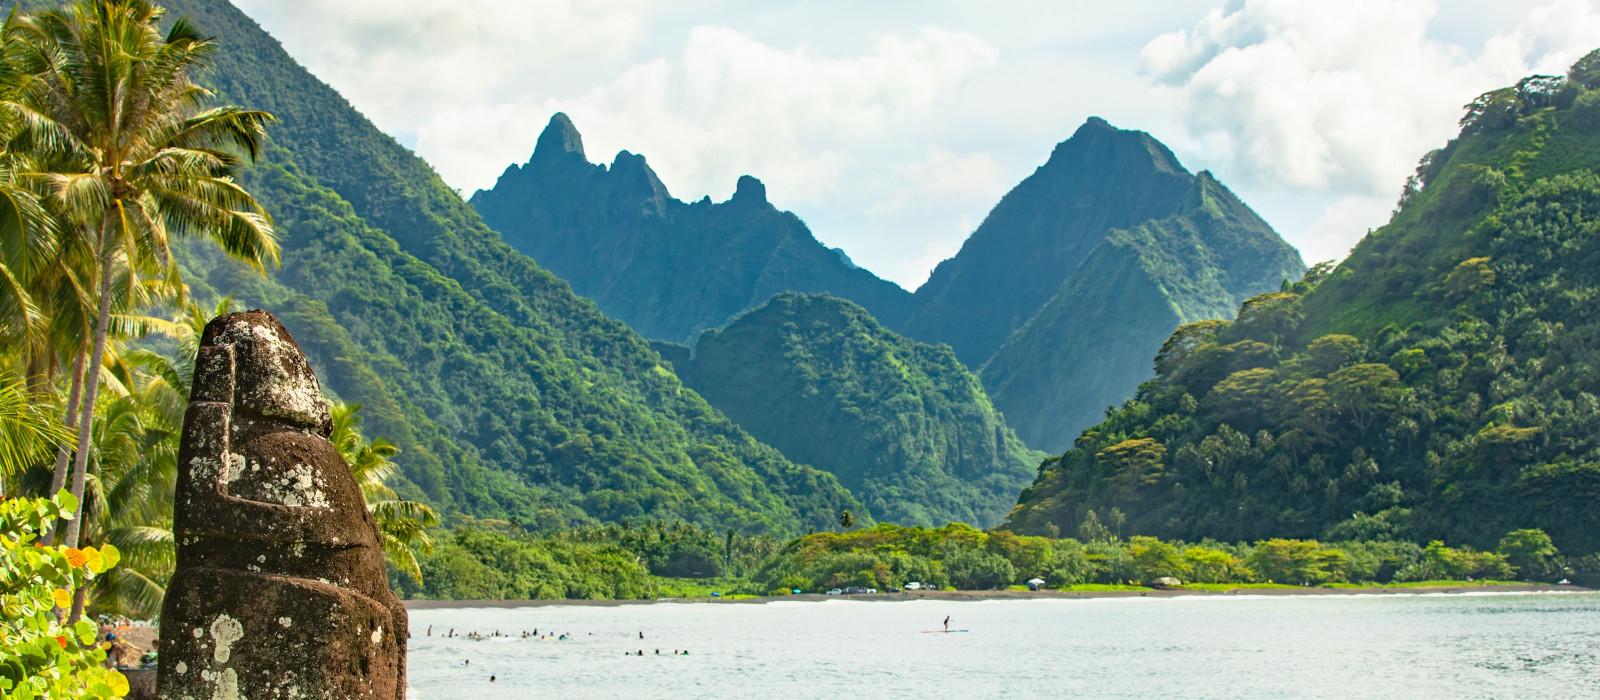 Destination Tahiti French Polynesia